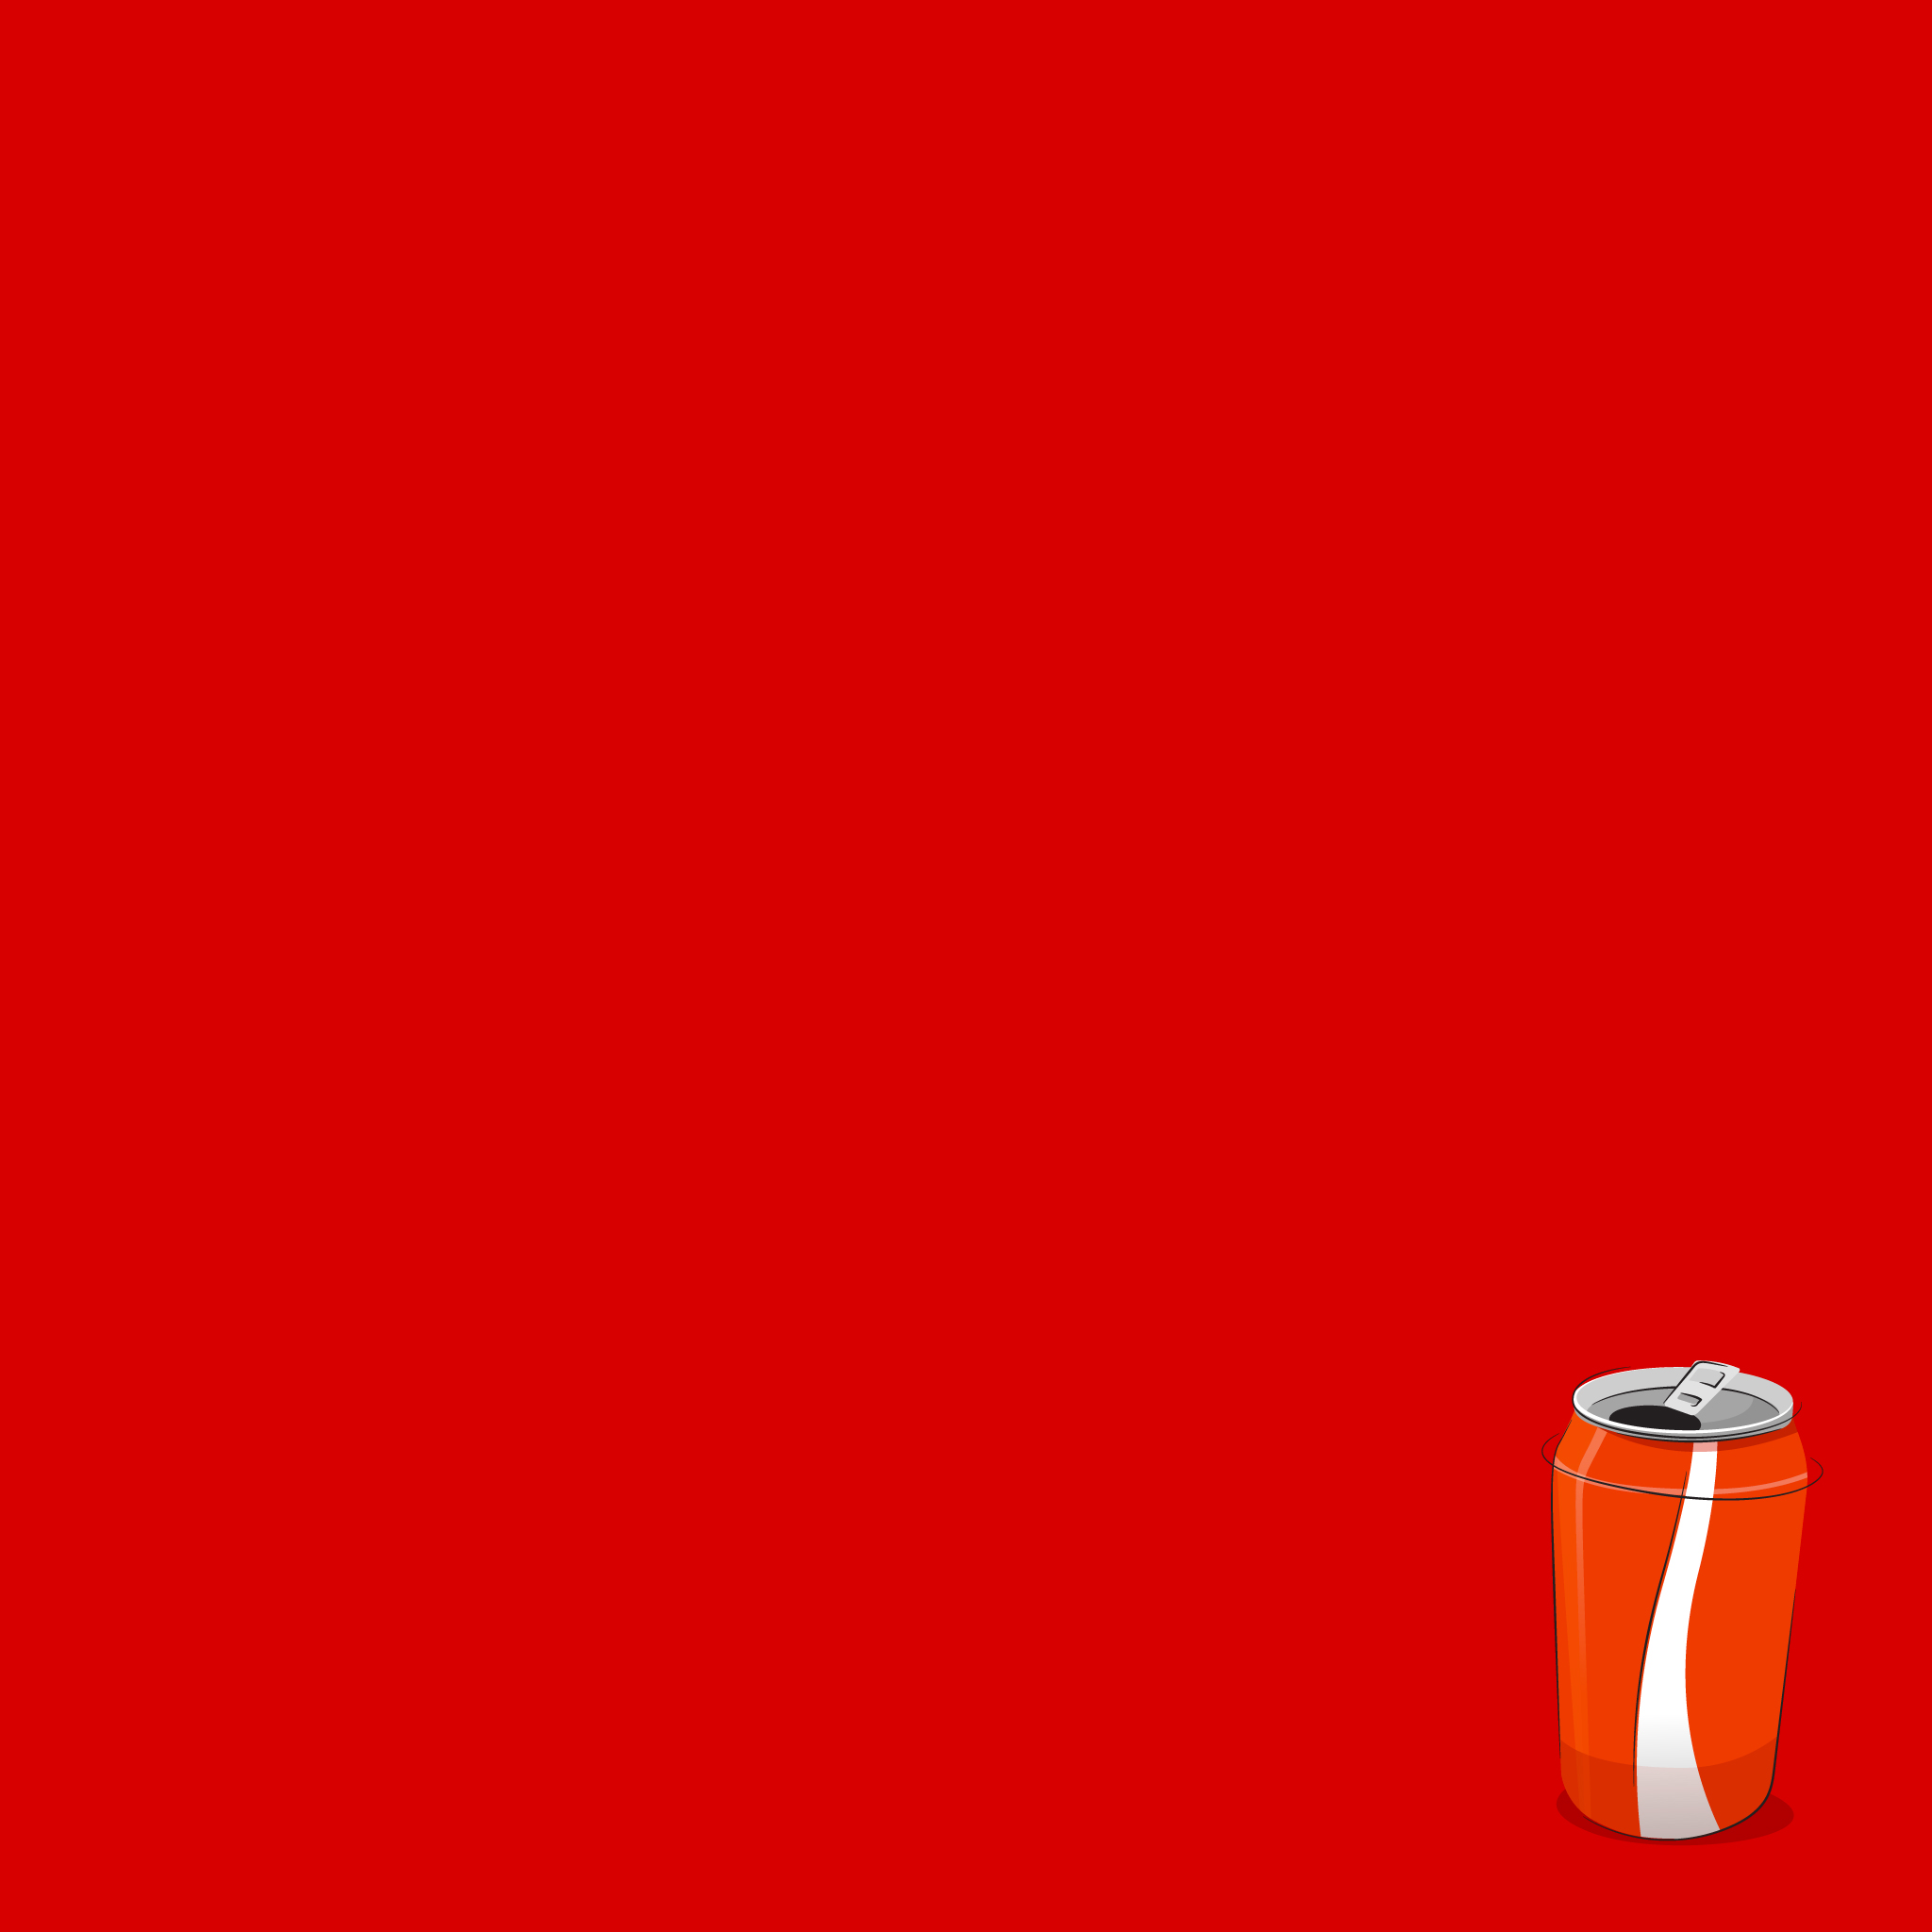 Coke-Can-3Wallpapers-iPad-Retina